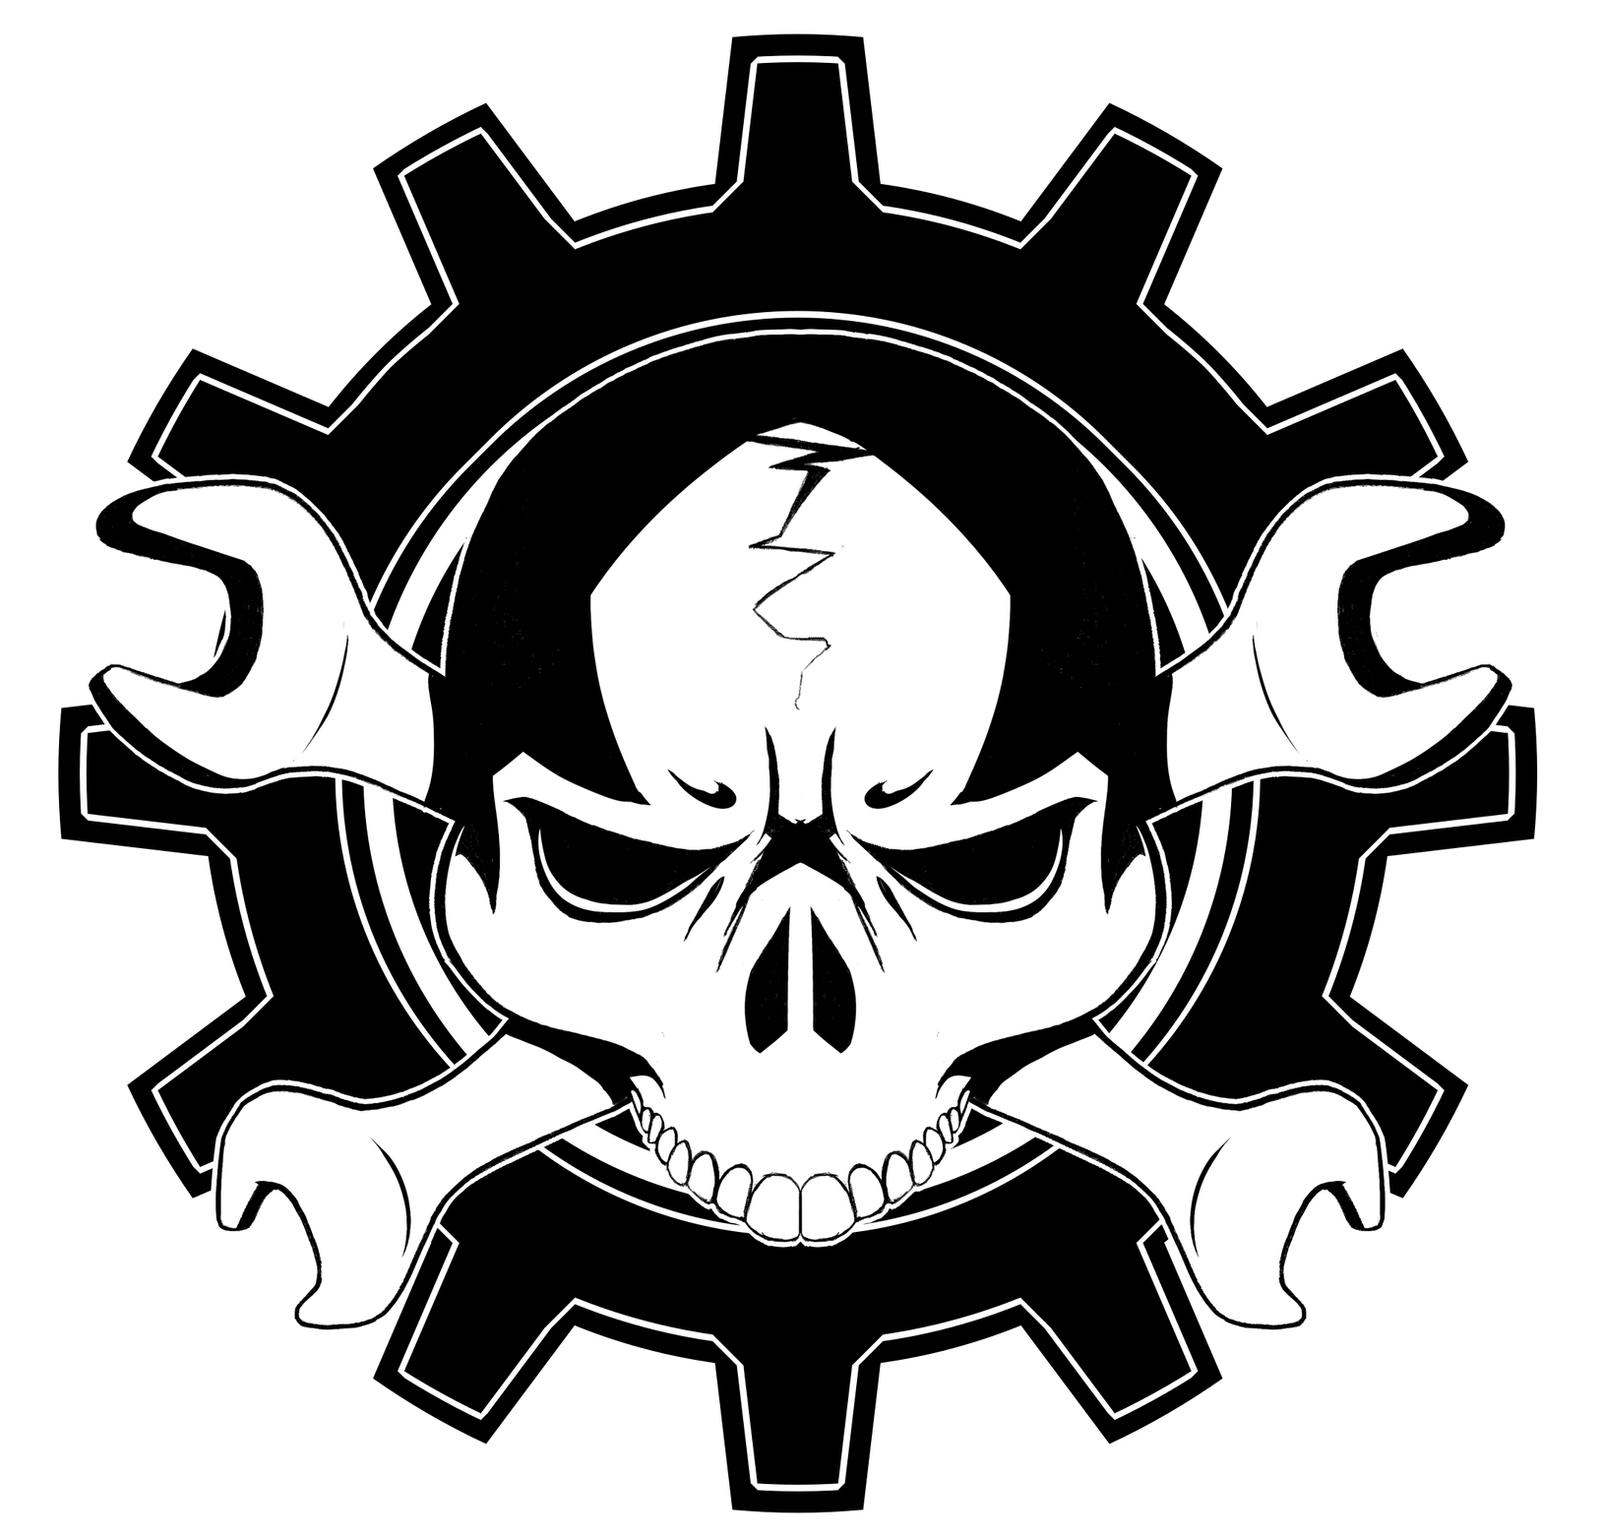 Commission: Mechanic logo by Menaria on DeviantArt